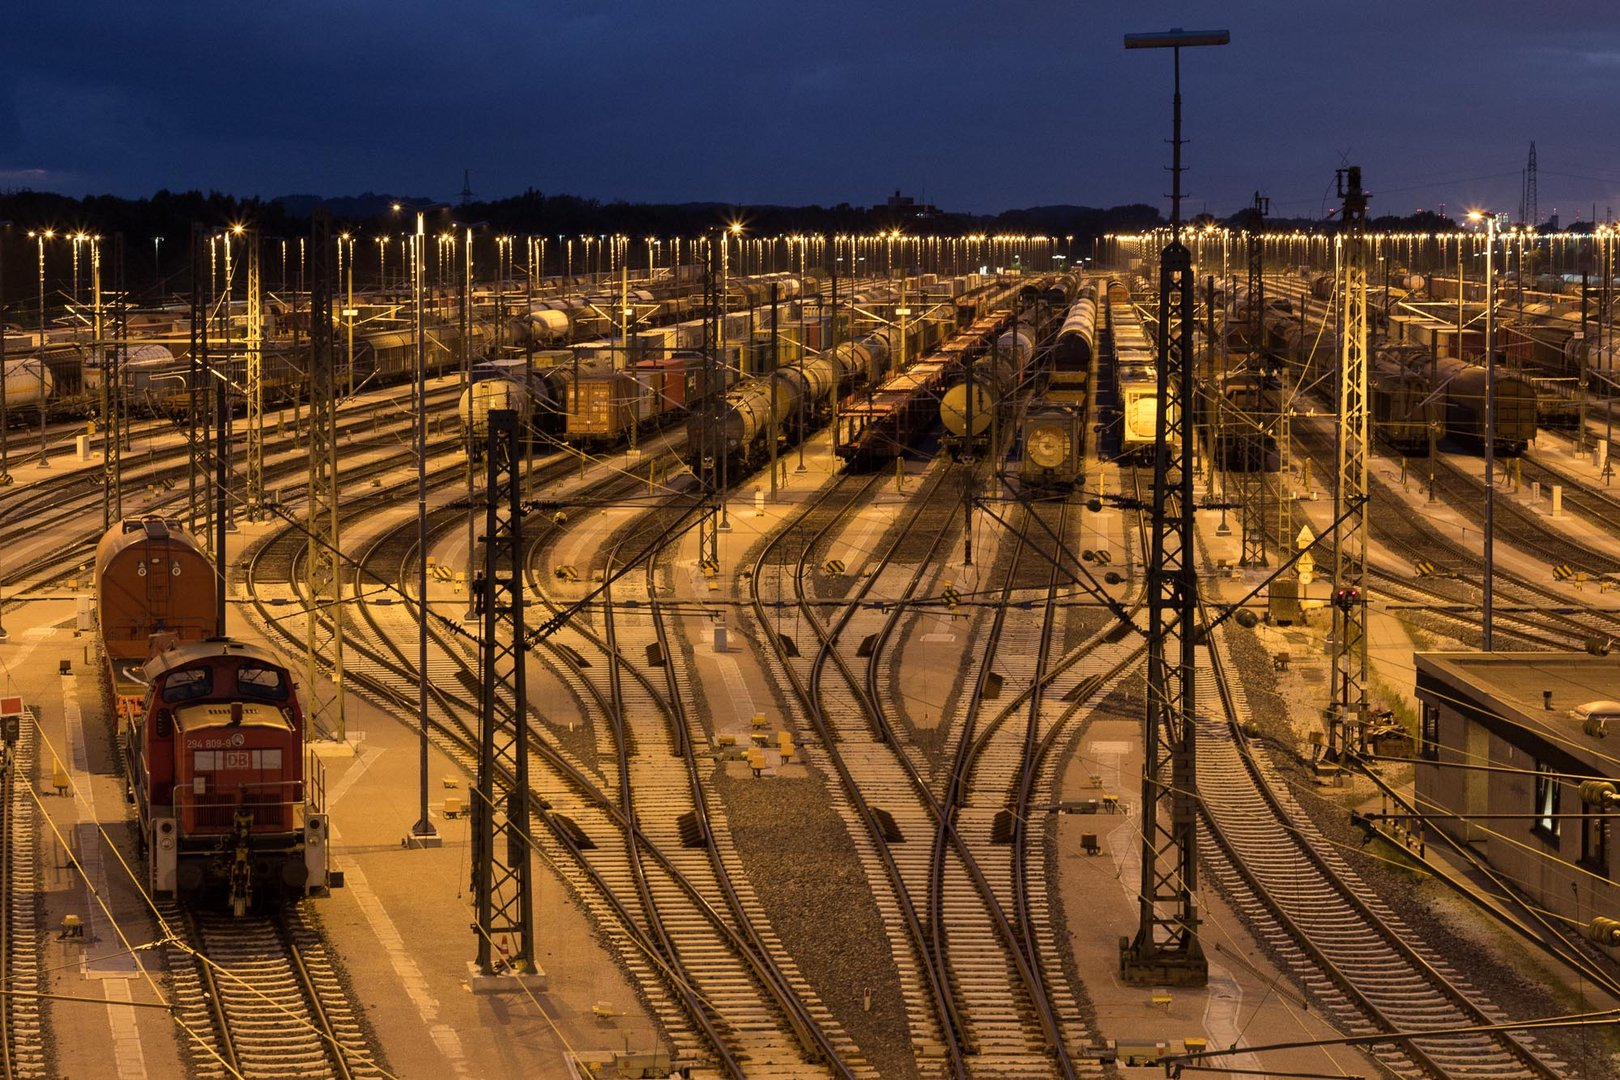 Güterbahnhof Maschen - Reloaded